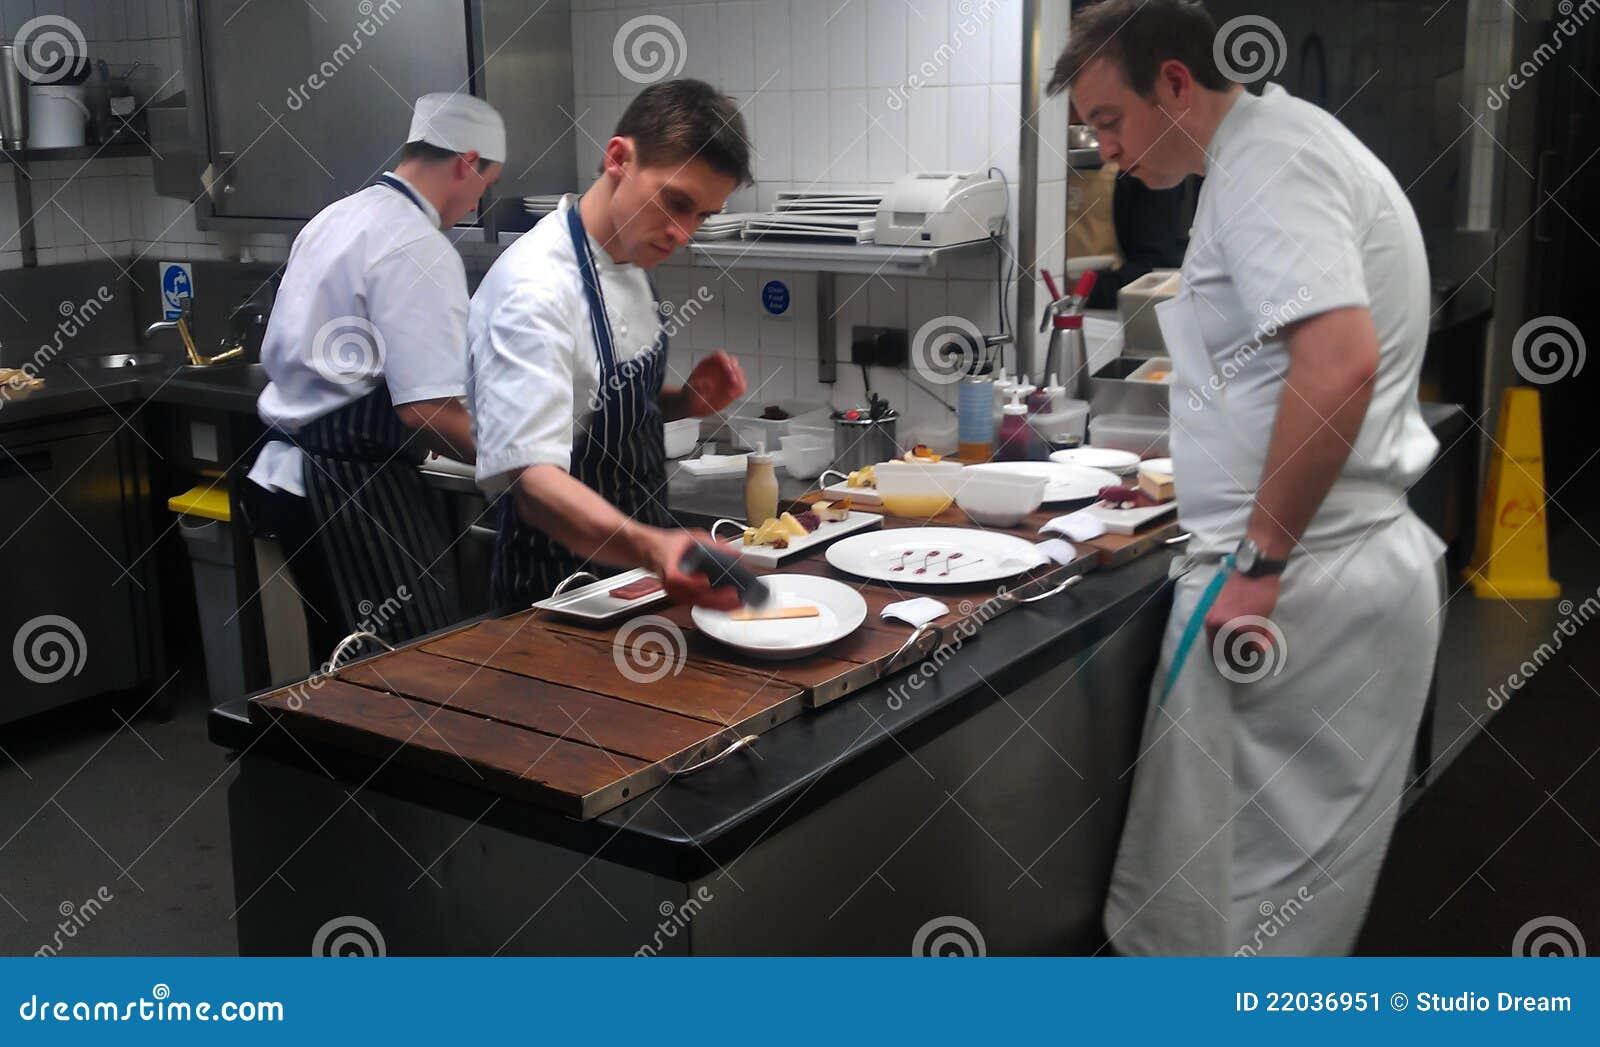 Maze Restaurant London Menu